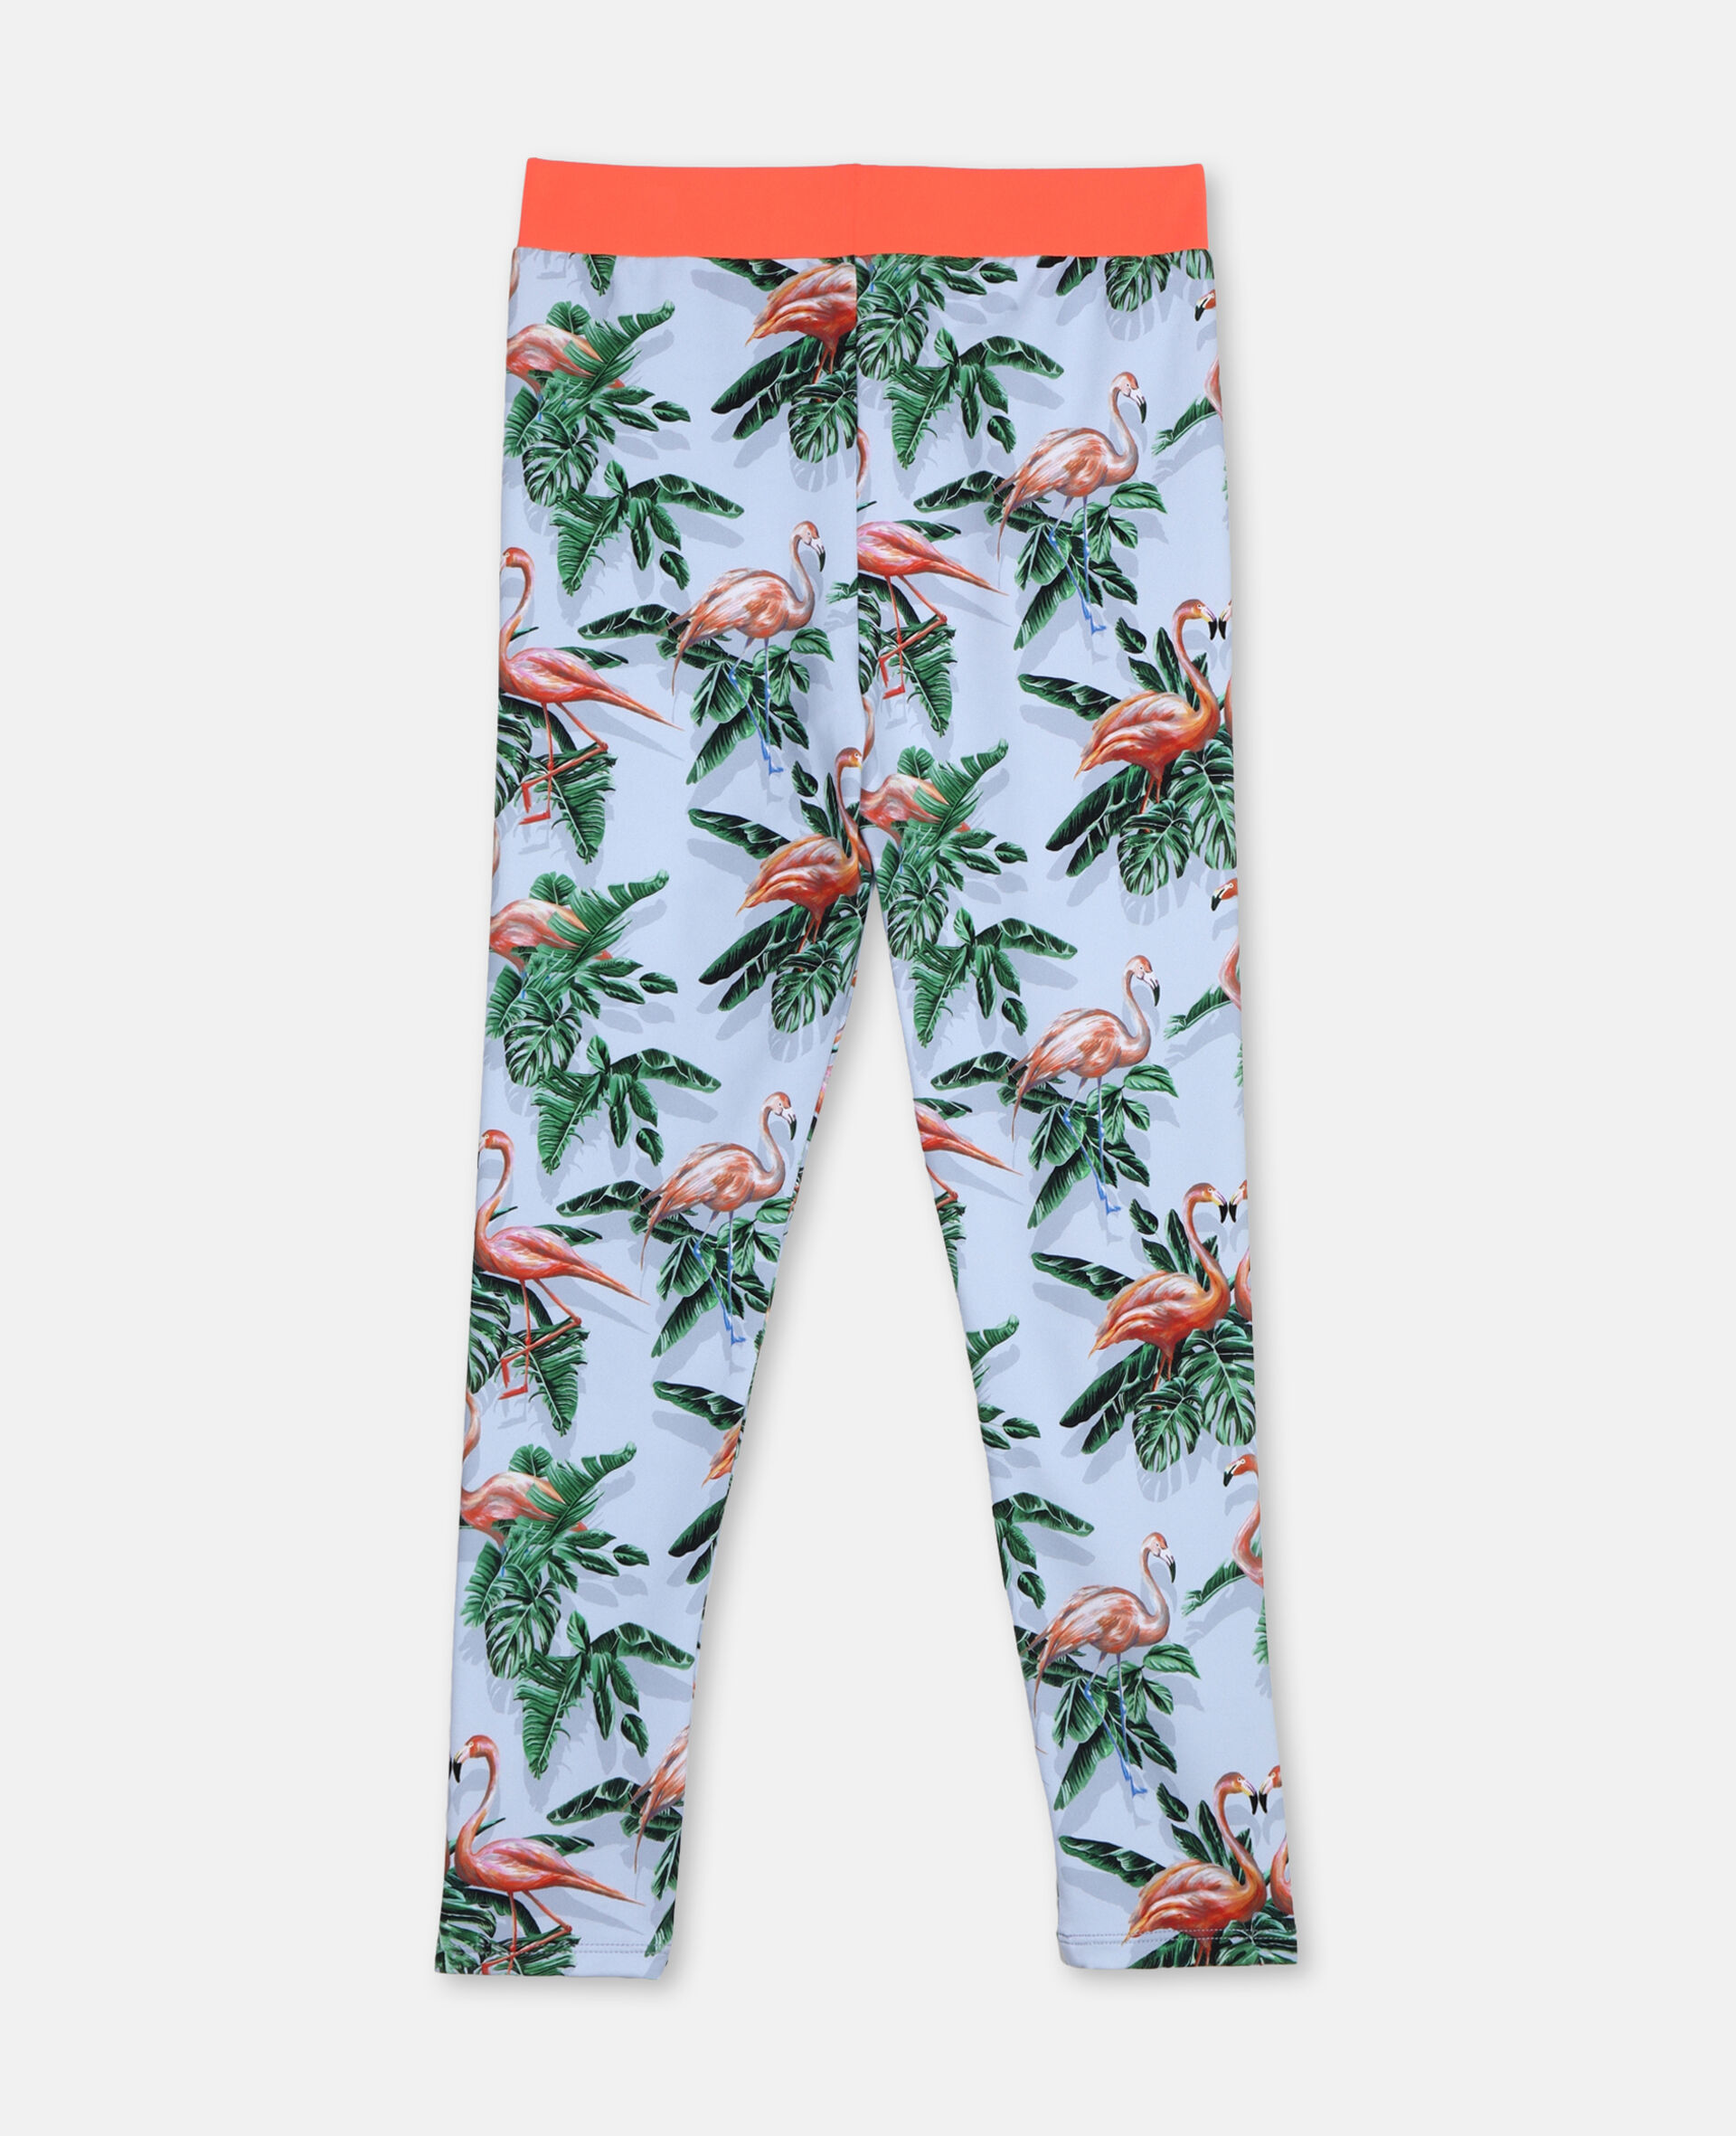 Painty Flamingo贴腿裤-绿色-large image number 3